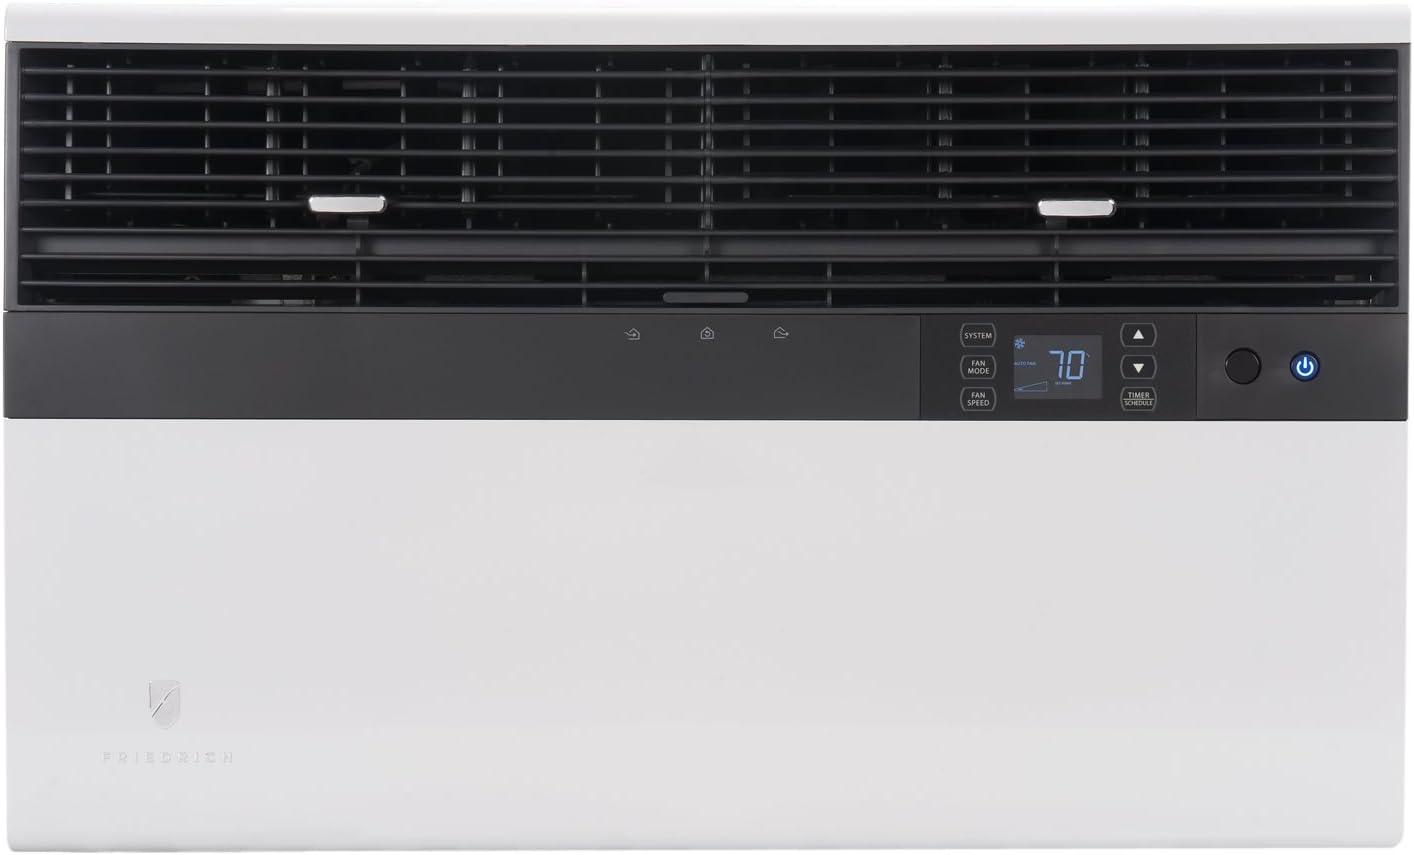 Friedrich Commercial Kuhl Window アイテム勢ぞろい Wall Heat w Pum Conditioner ブランド買うならブランドオフ Air